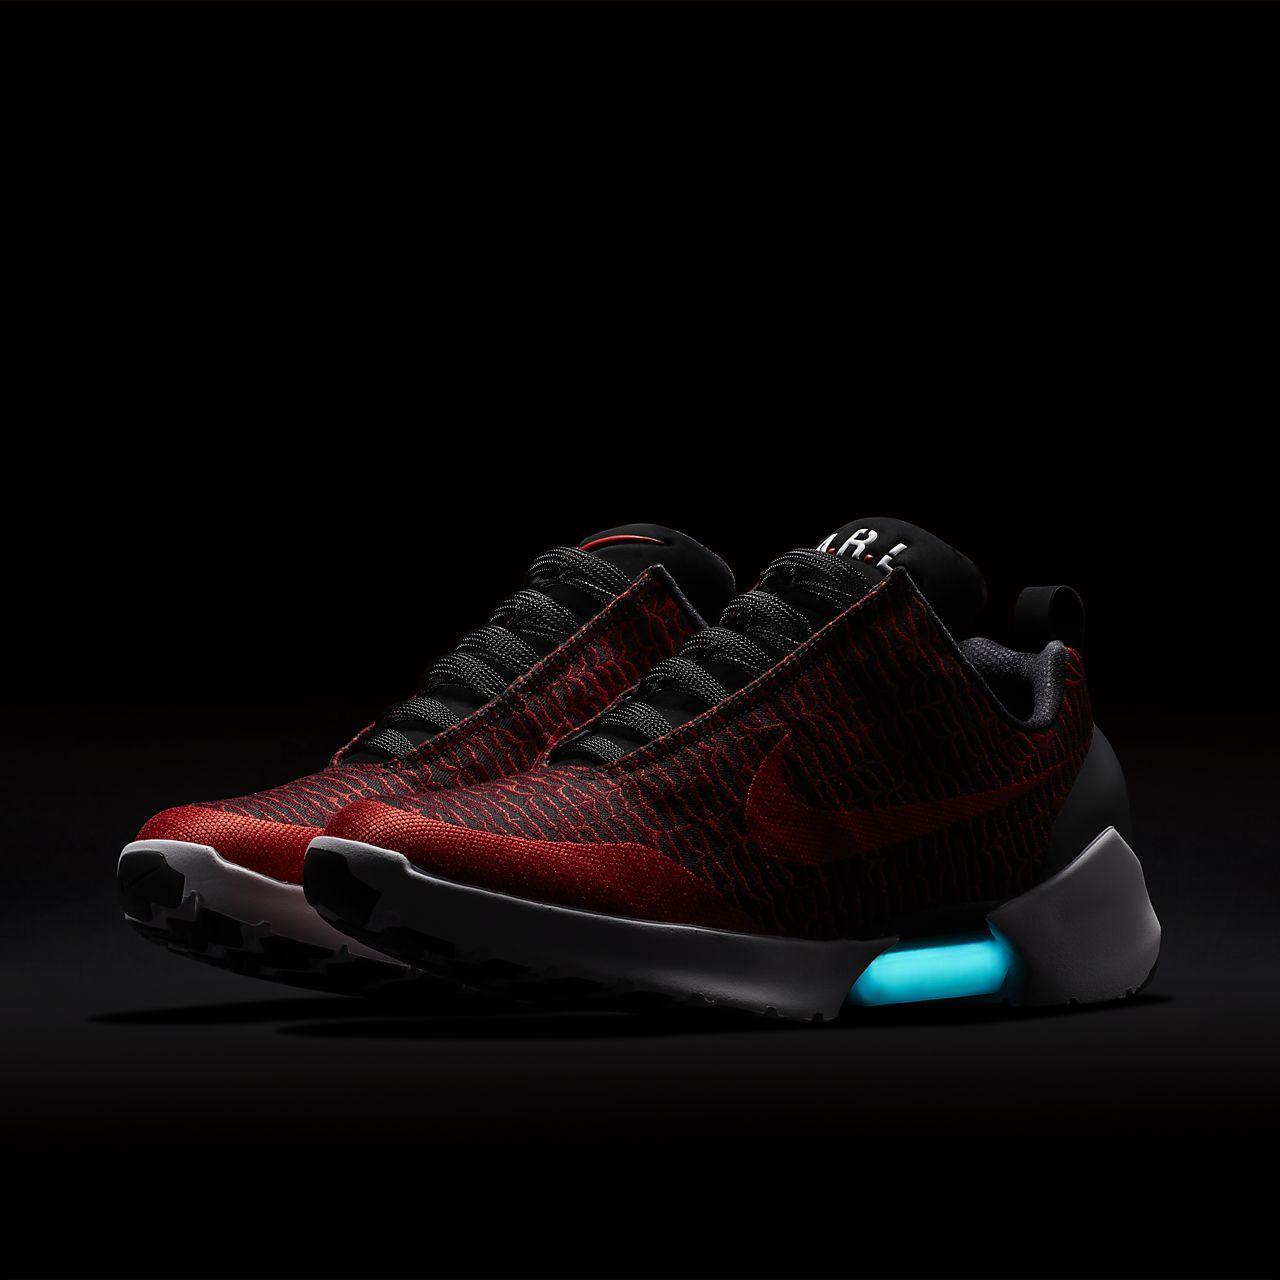 Hyperadapt Nike Pour Chaussure Gb Hommeprise 1 0 wXZTPuOkil